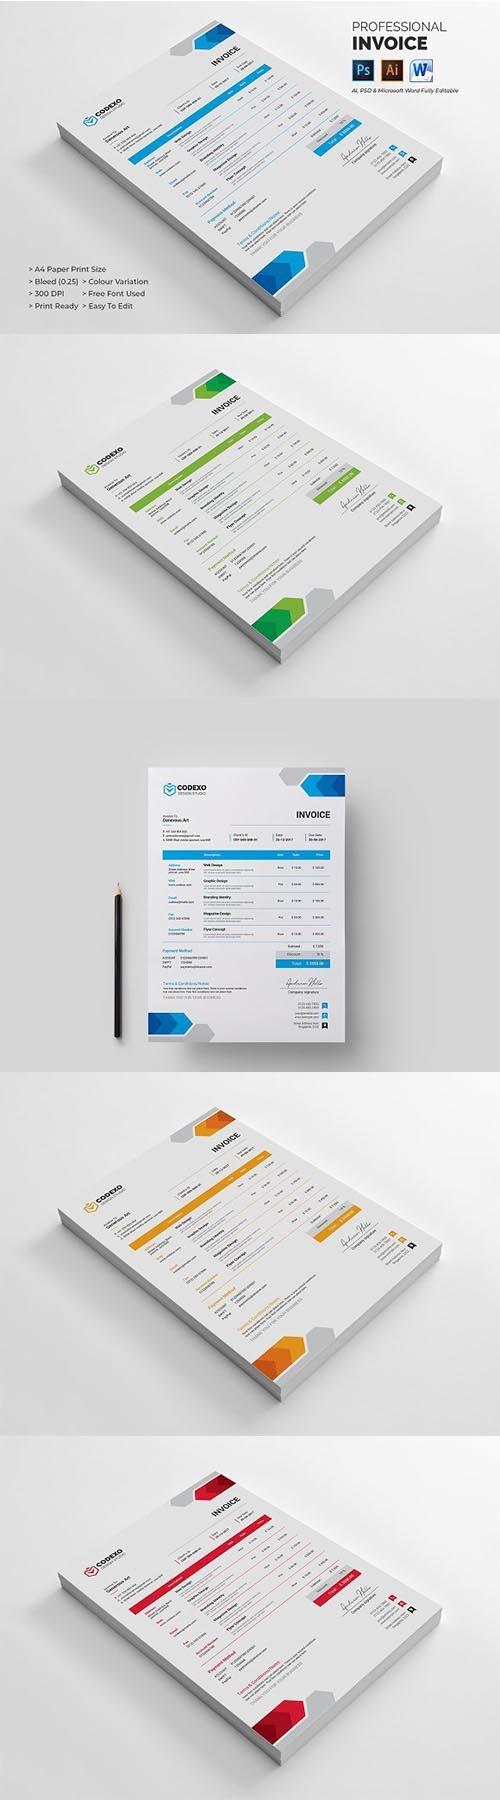 CreativeMarket - Invoice 2291878